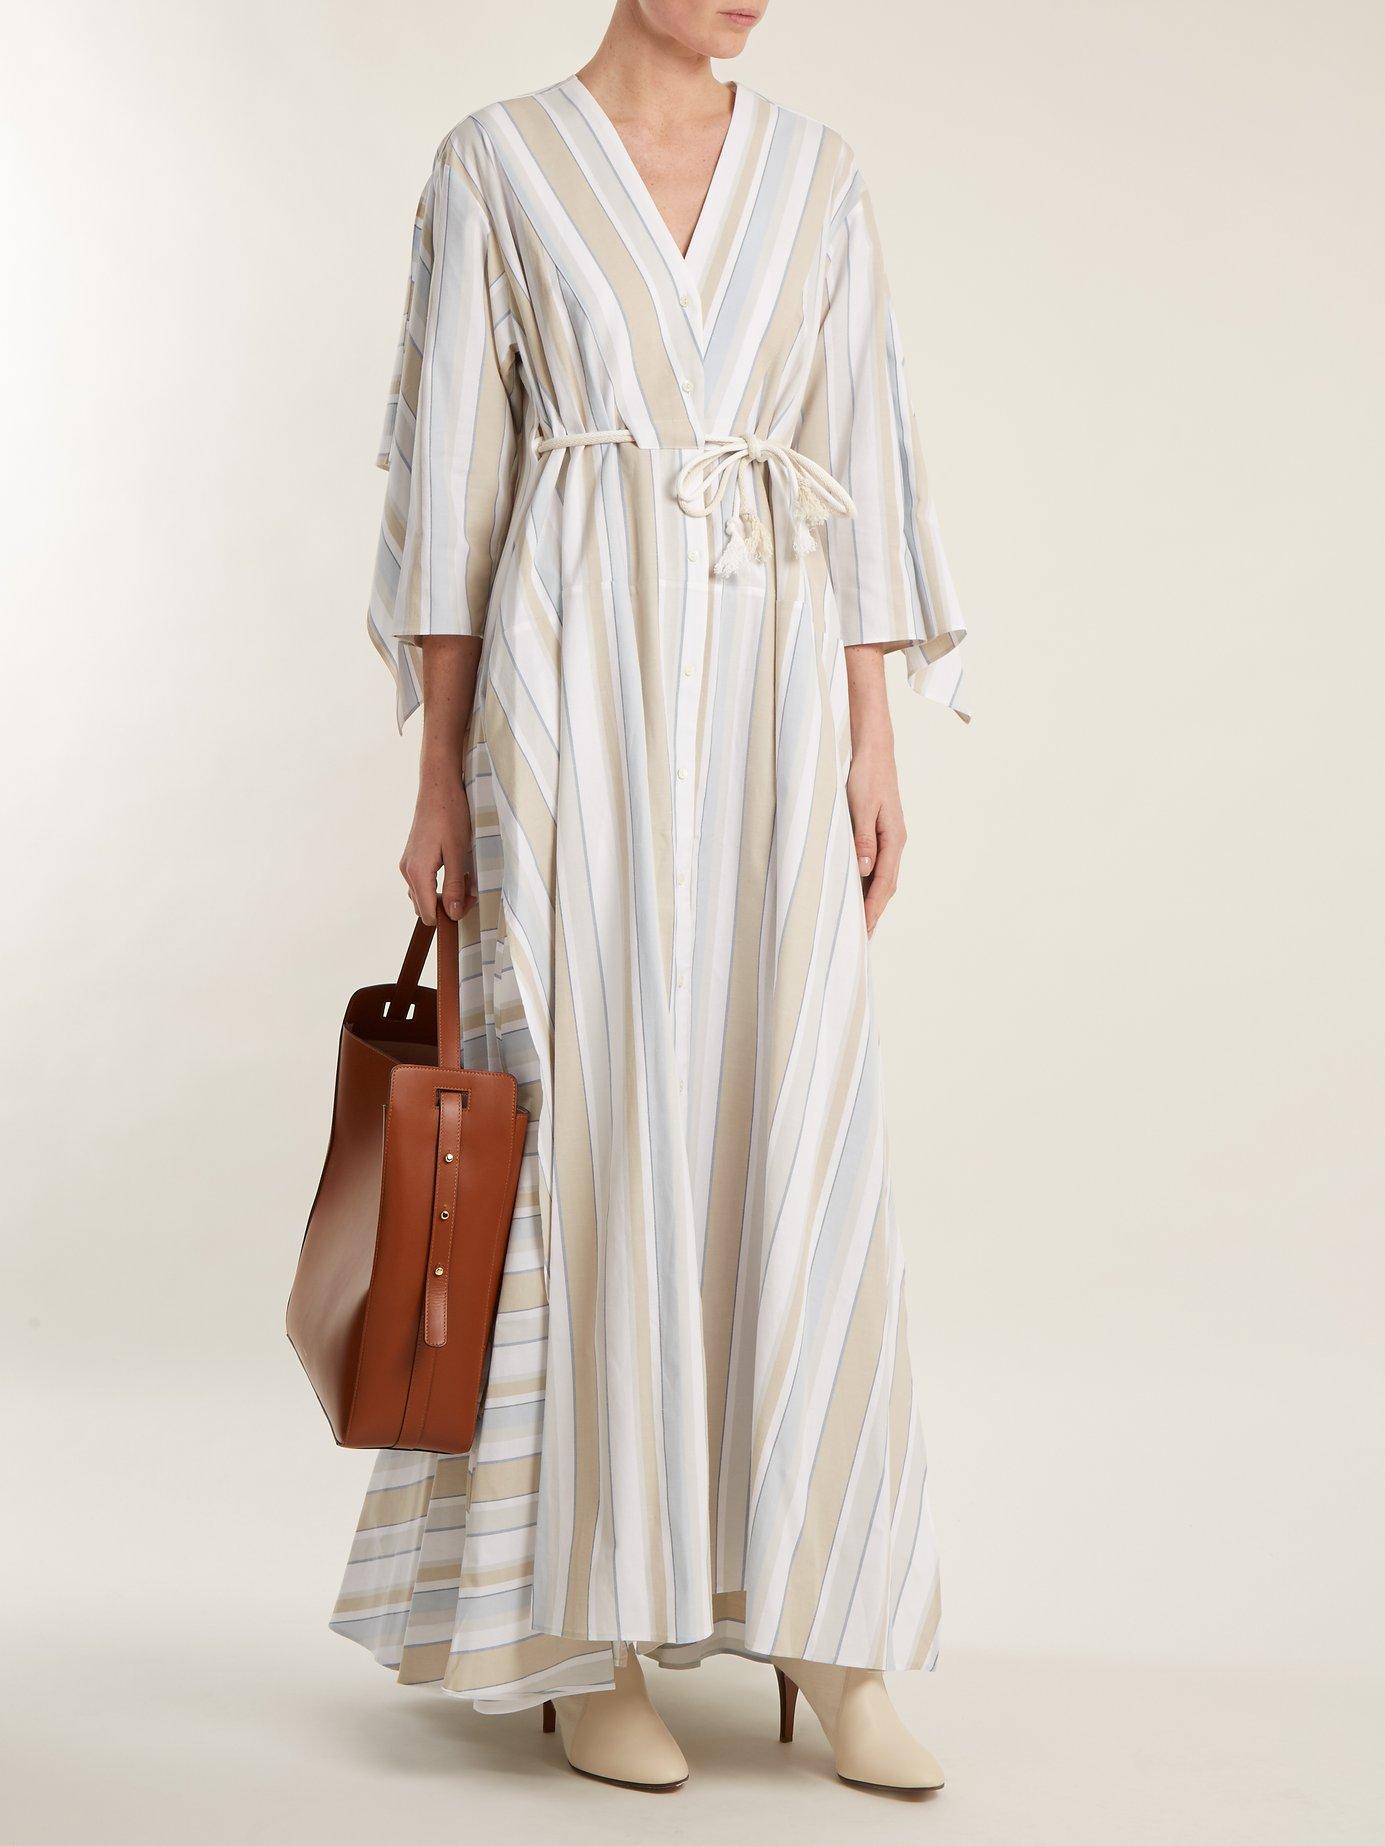 Striped drawstring-waist cotton-blend maxi dress by Palmer/Harding